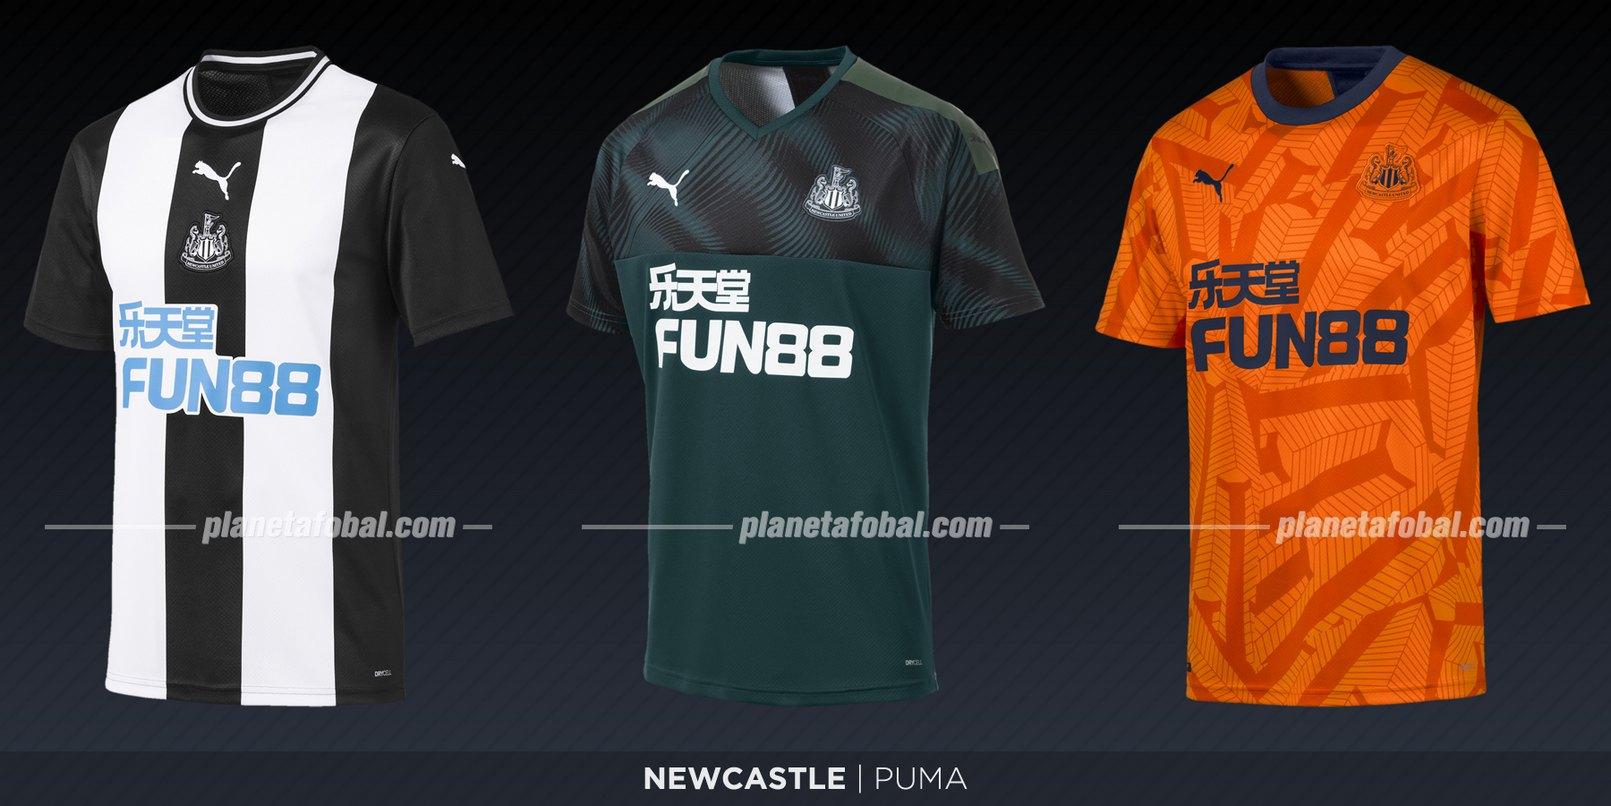 Newcastle (Puma) | Camisetas de la Premier League 2019-2020